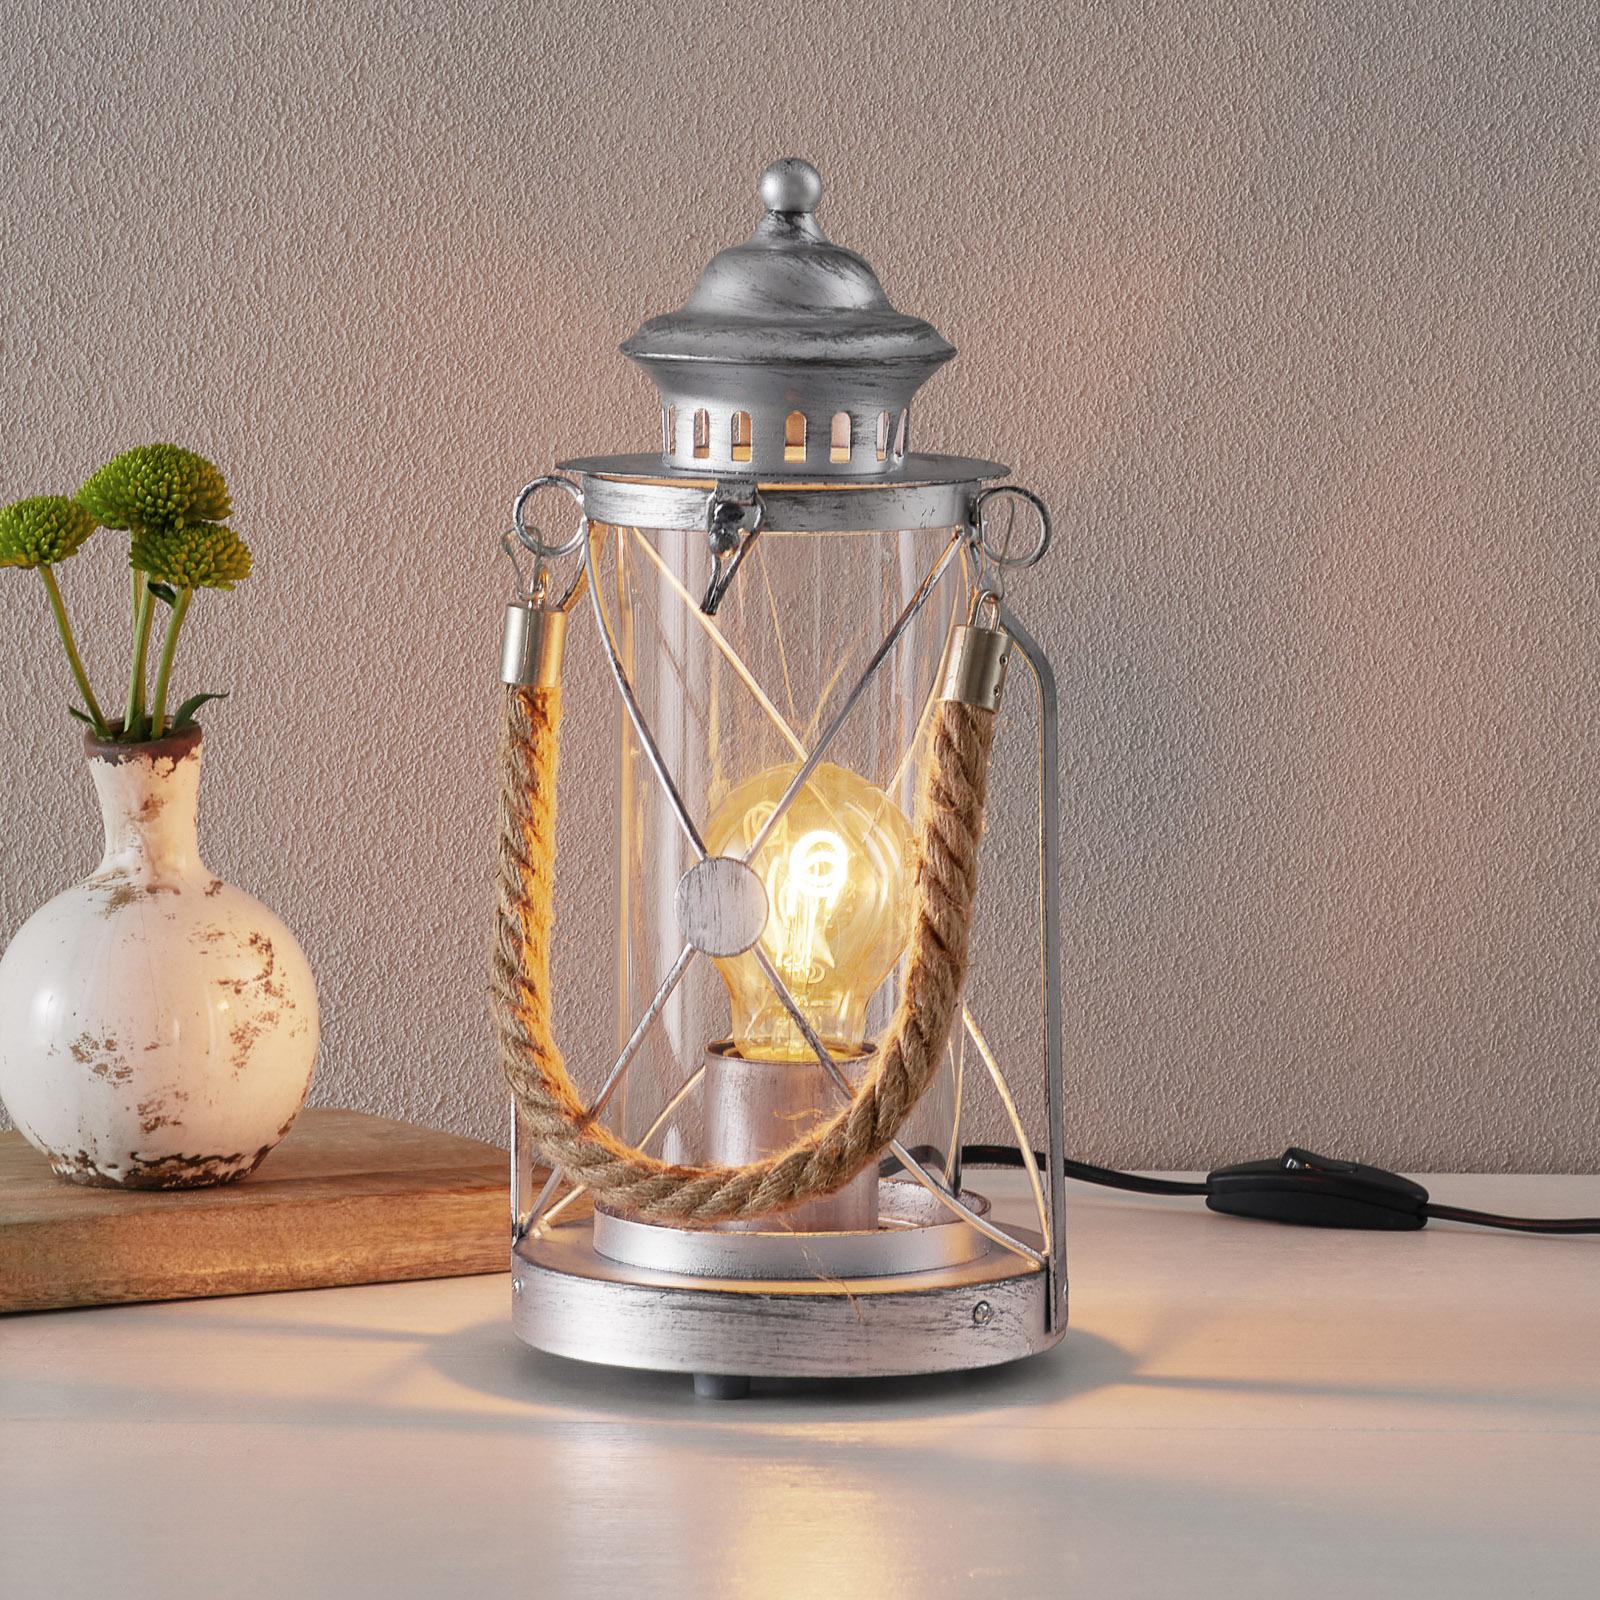 Heldere lantaarn tafellamp Kirian zilver-antiek